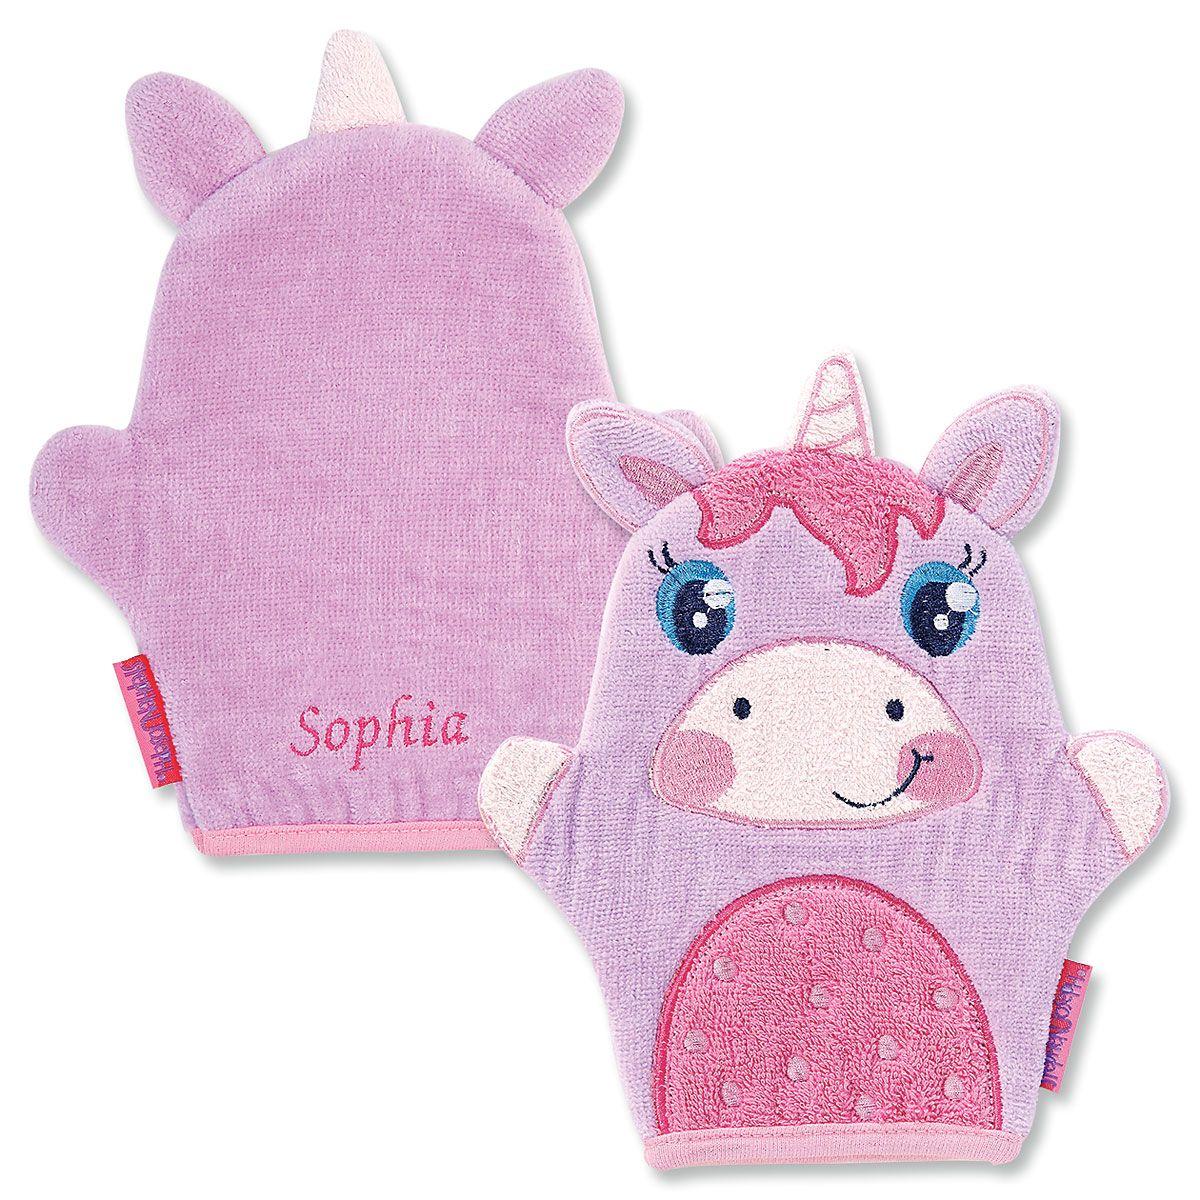 Personalized Unicorn Bath Mitt by Stephen Joseph®